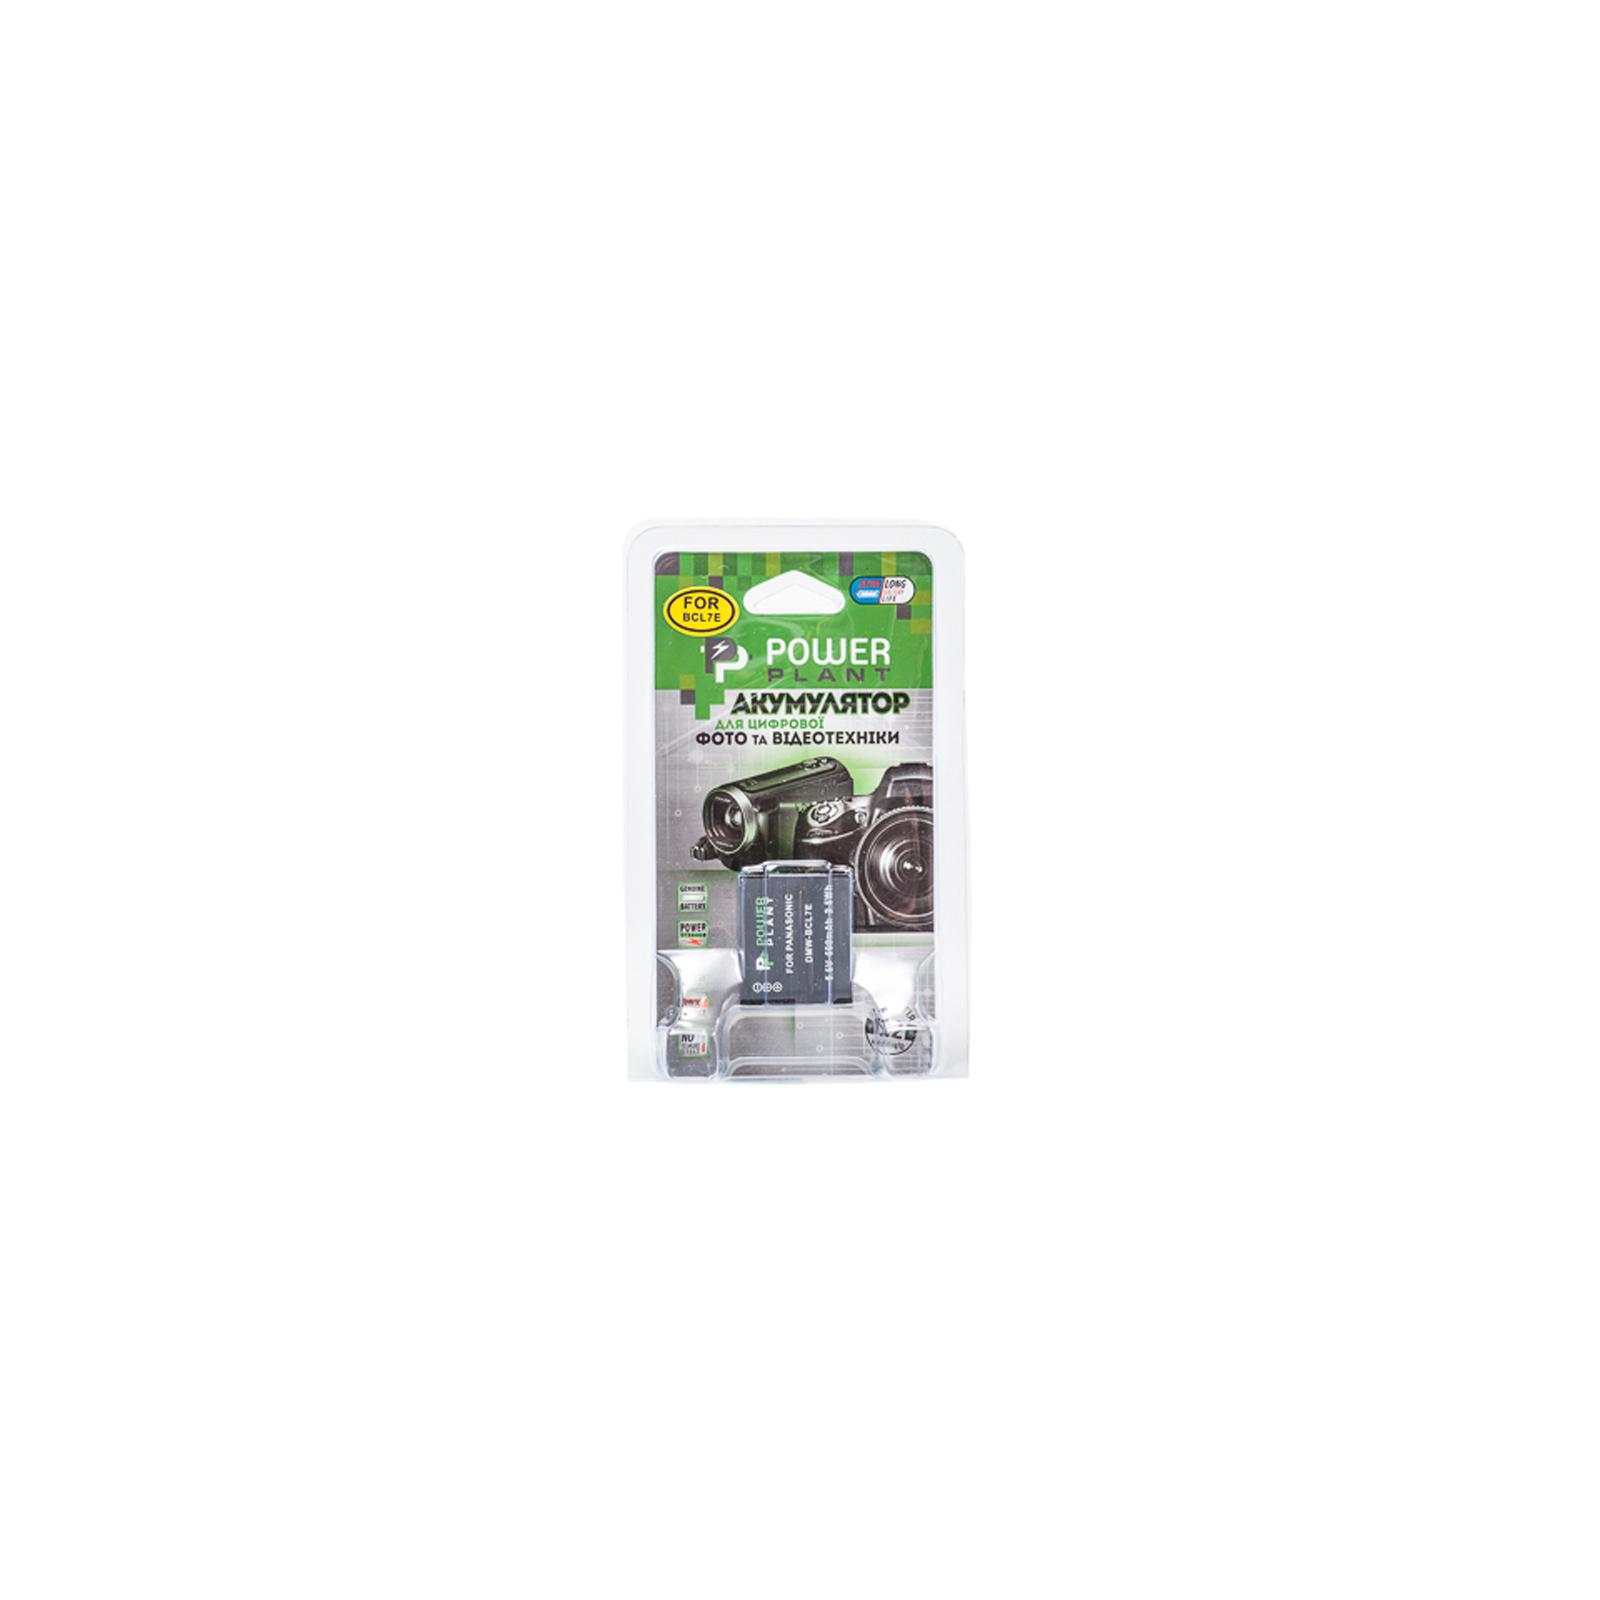 Аккумулятор к фото/видео PowerPlant Panasonic DMW-BCL7E (DV00DV1380) изображение 3